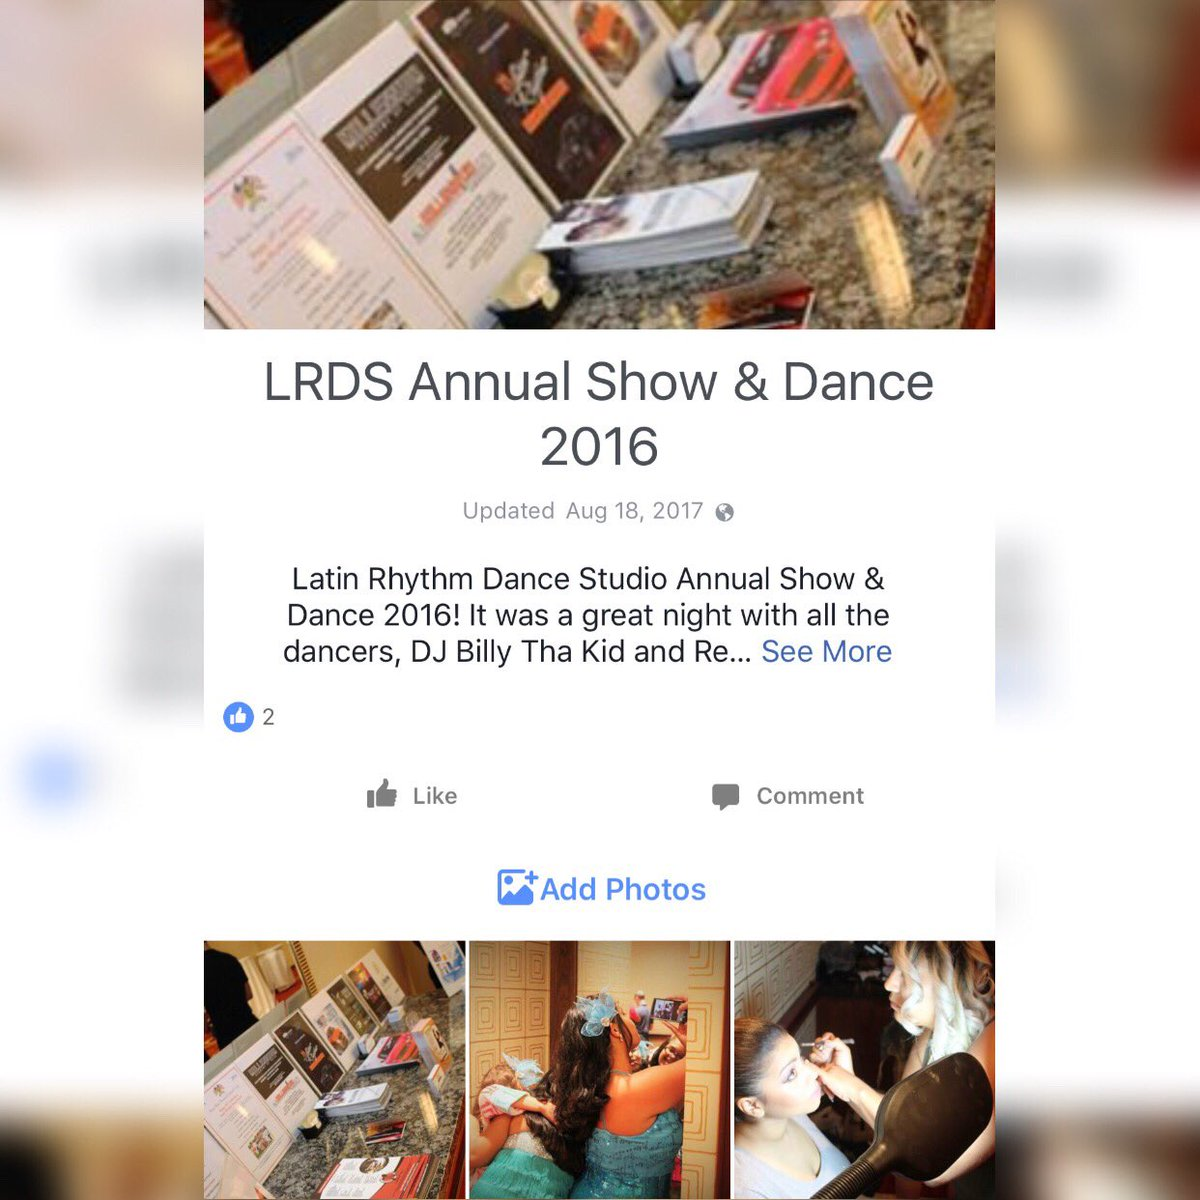 NEW 2016 Annual Show Album on  http://www. facebook.com/LatinRhythmStu dio &nbsp; …  #FBF #FlashbackFriday #LRDS #Dance #DanceLife #StratfordCT #CTSalsa #FridayFeeling<br>http://pic.twitter.com/gYMPyA1MWW